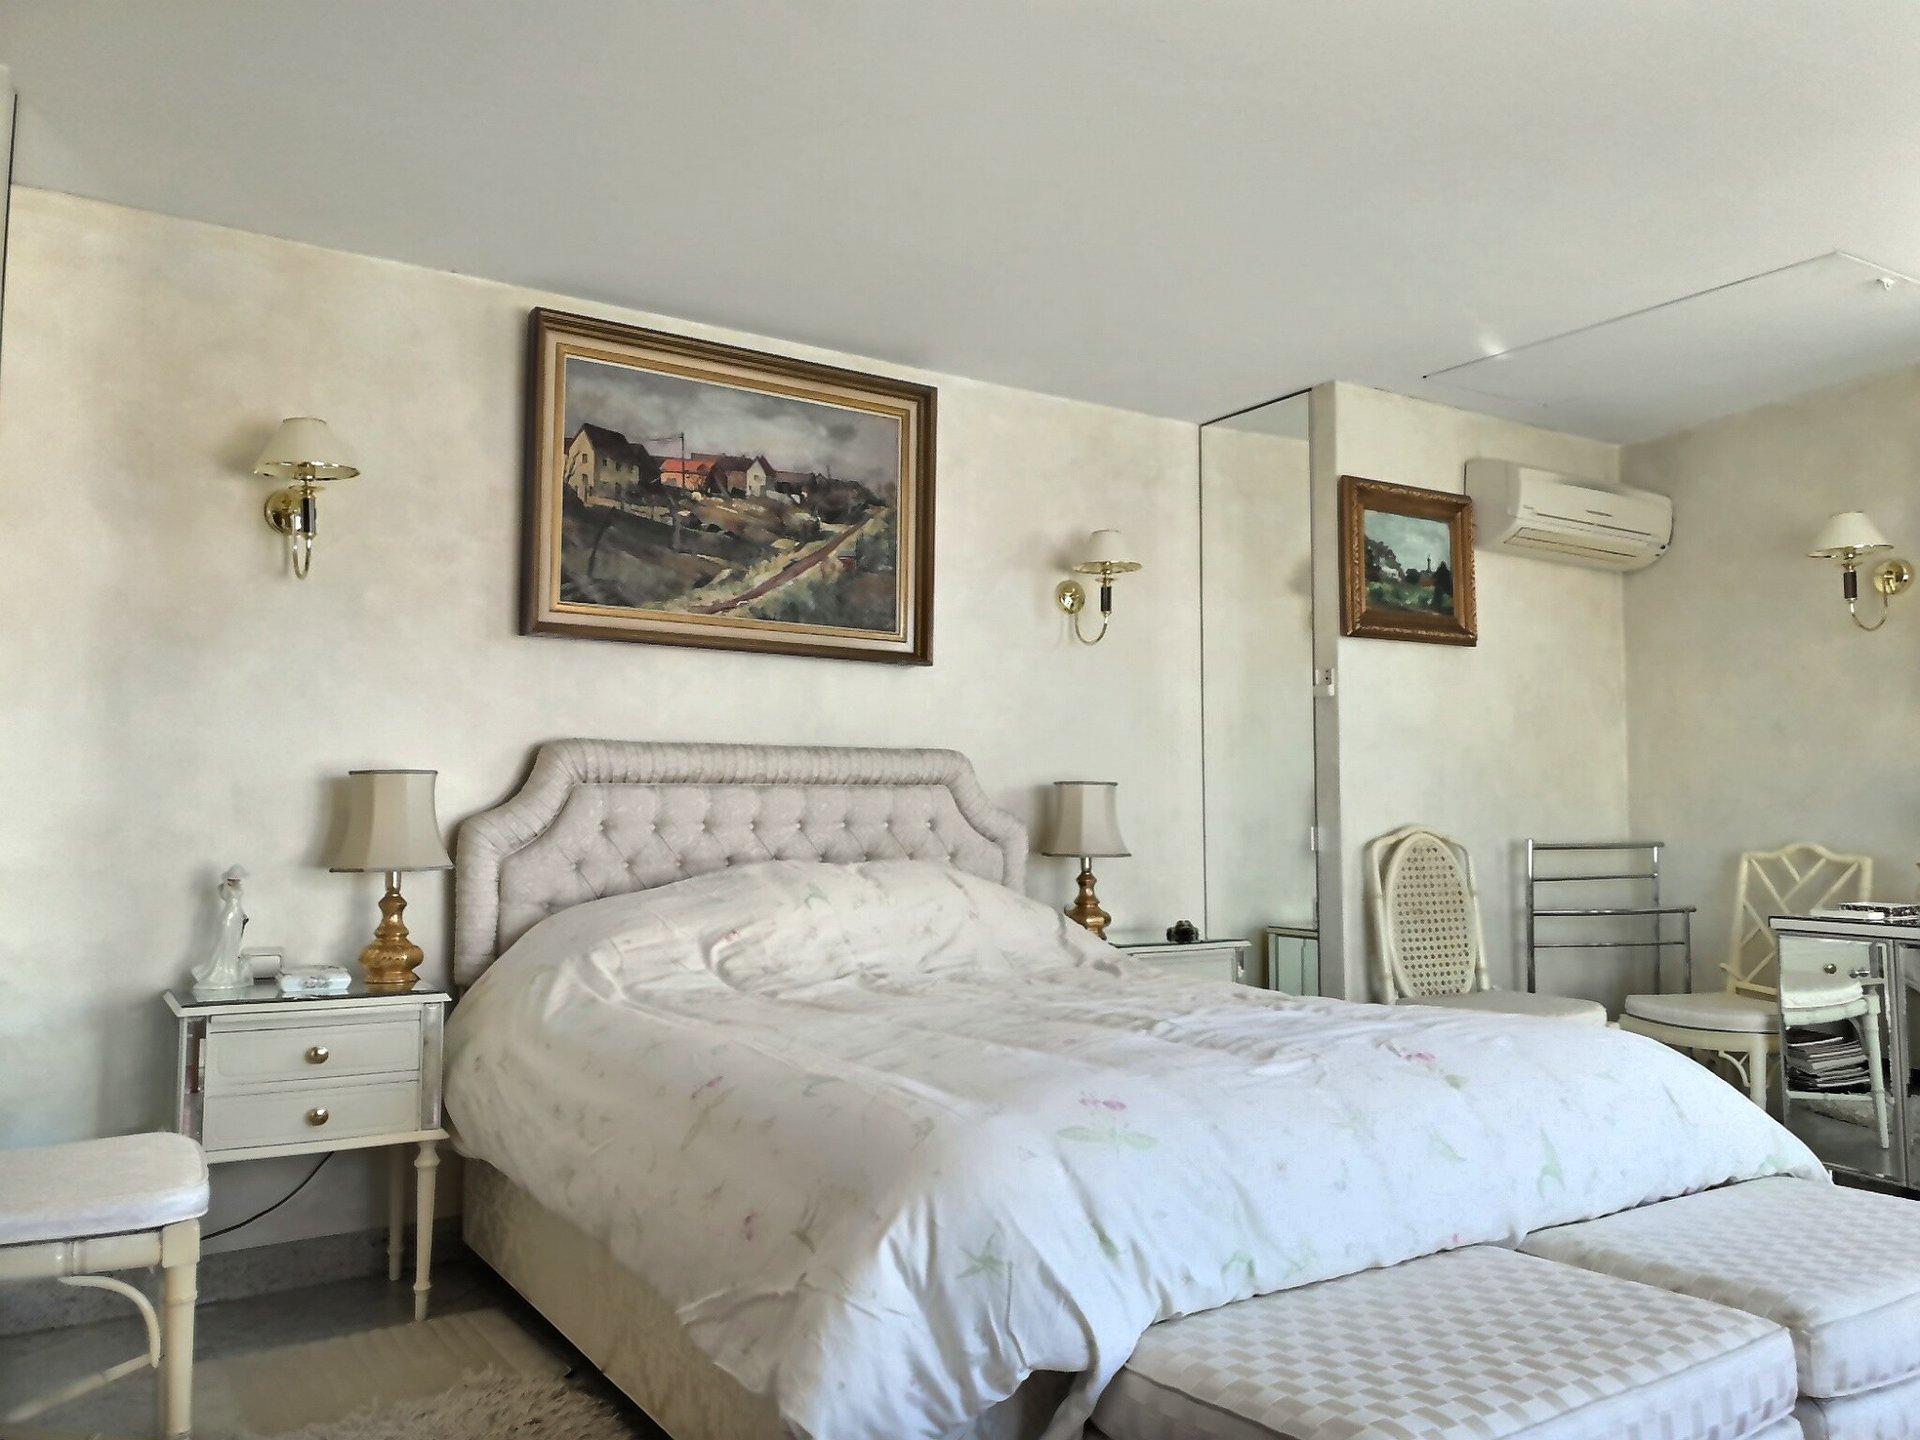 Vendita Casa di paese - Antibes